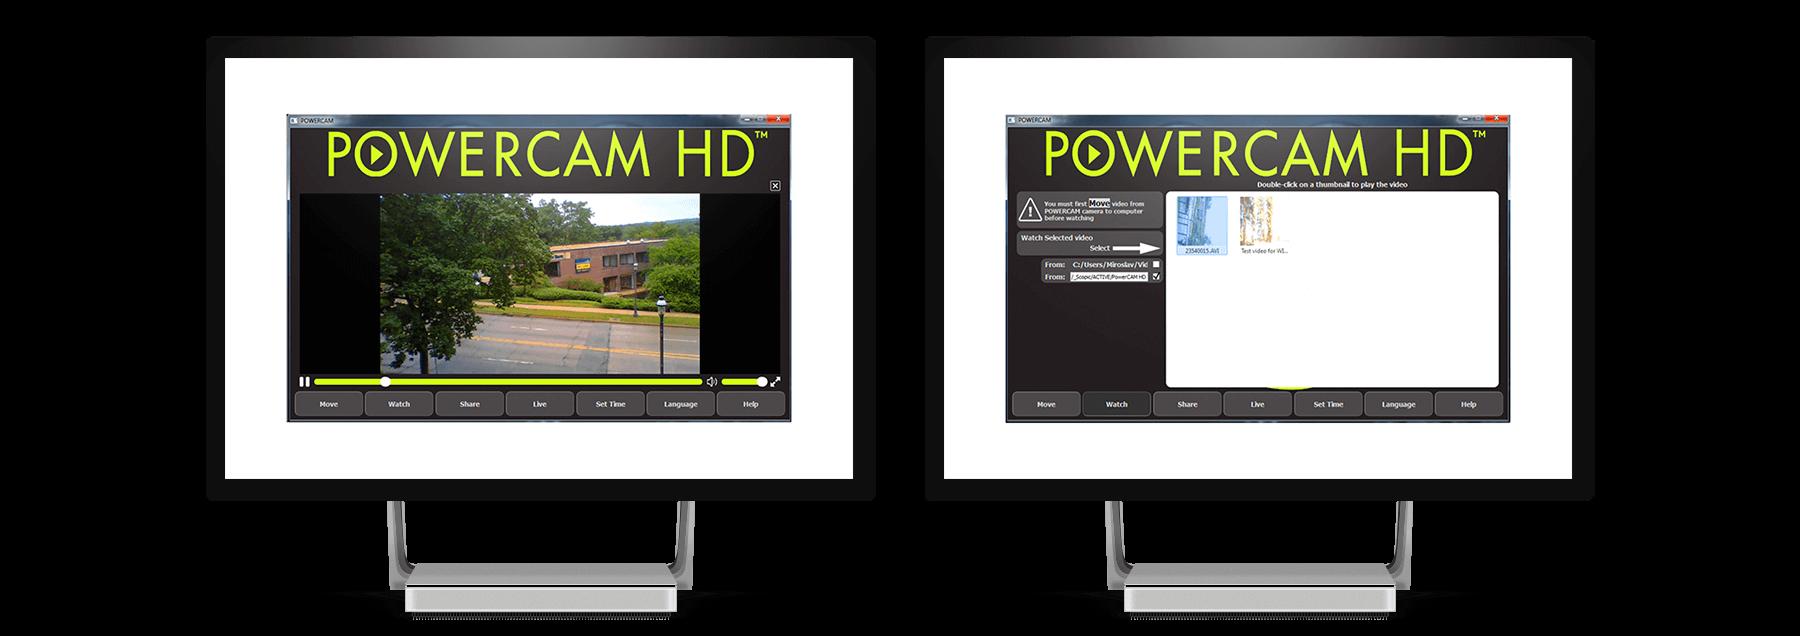 PowerCamHD solution